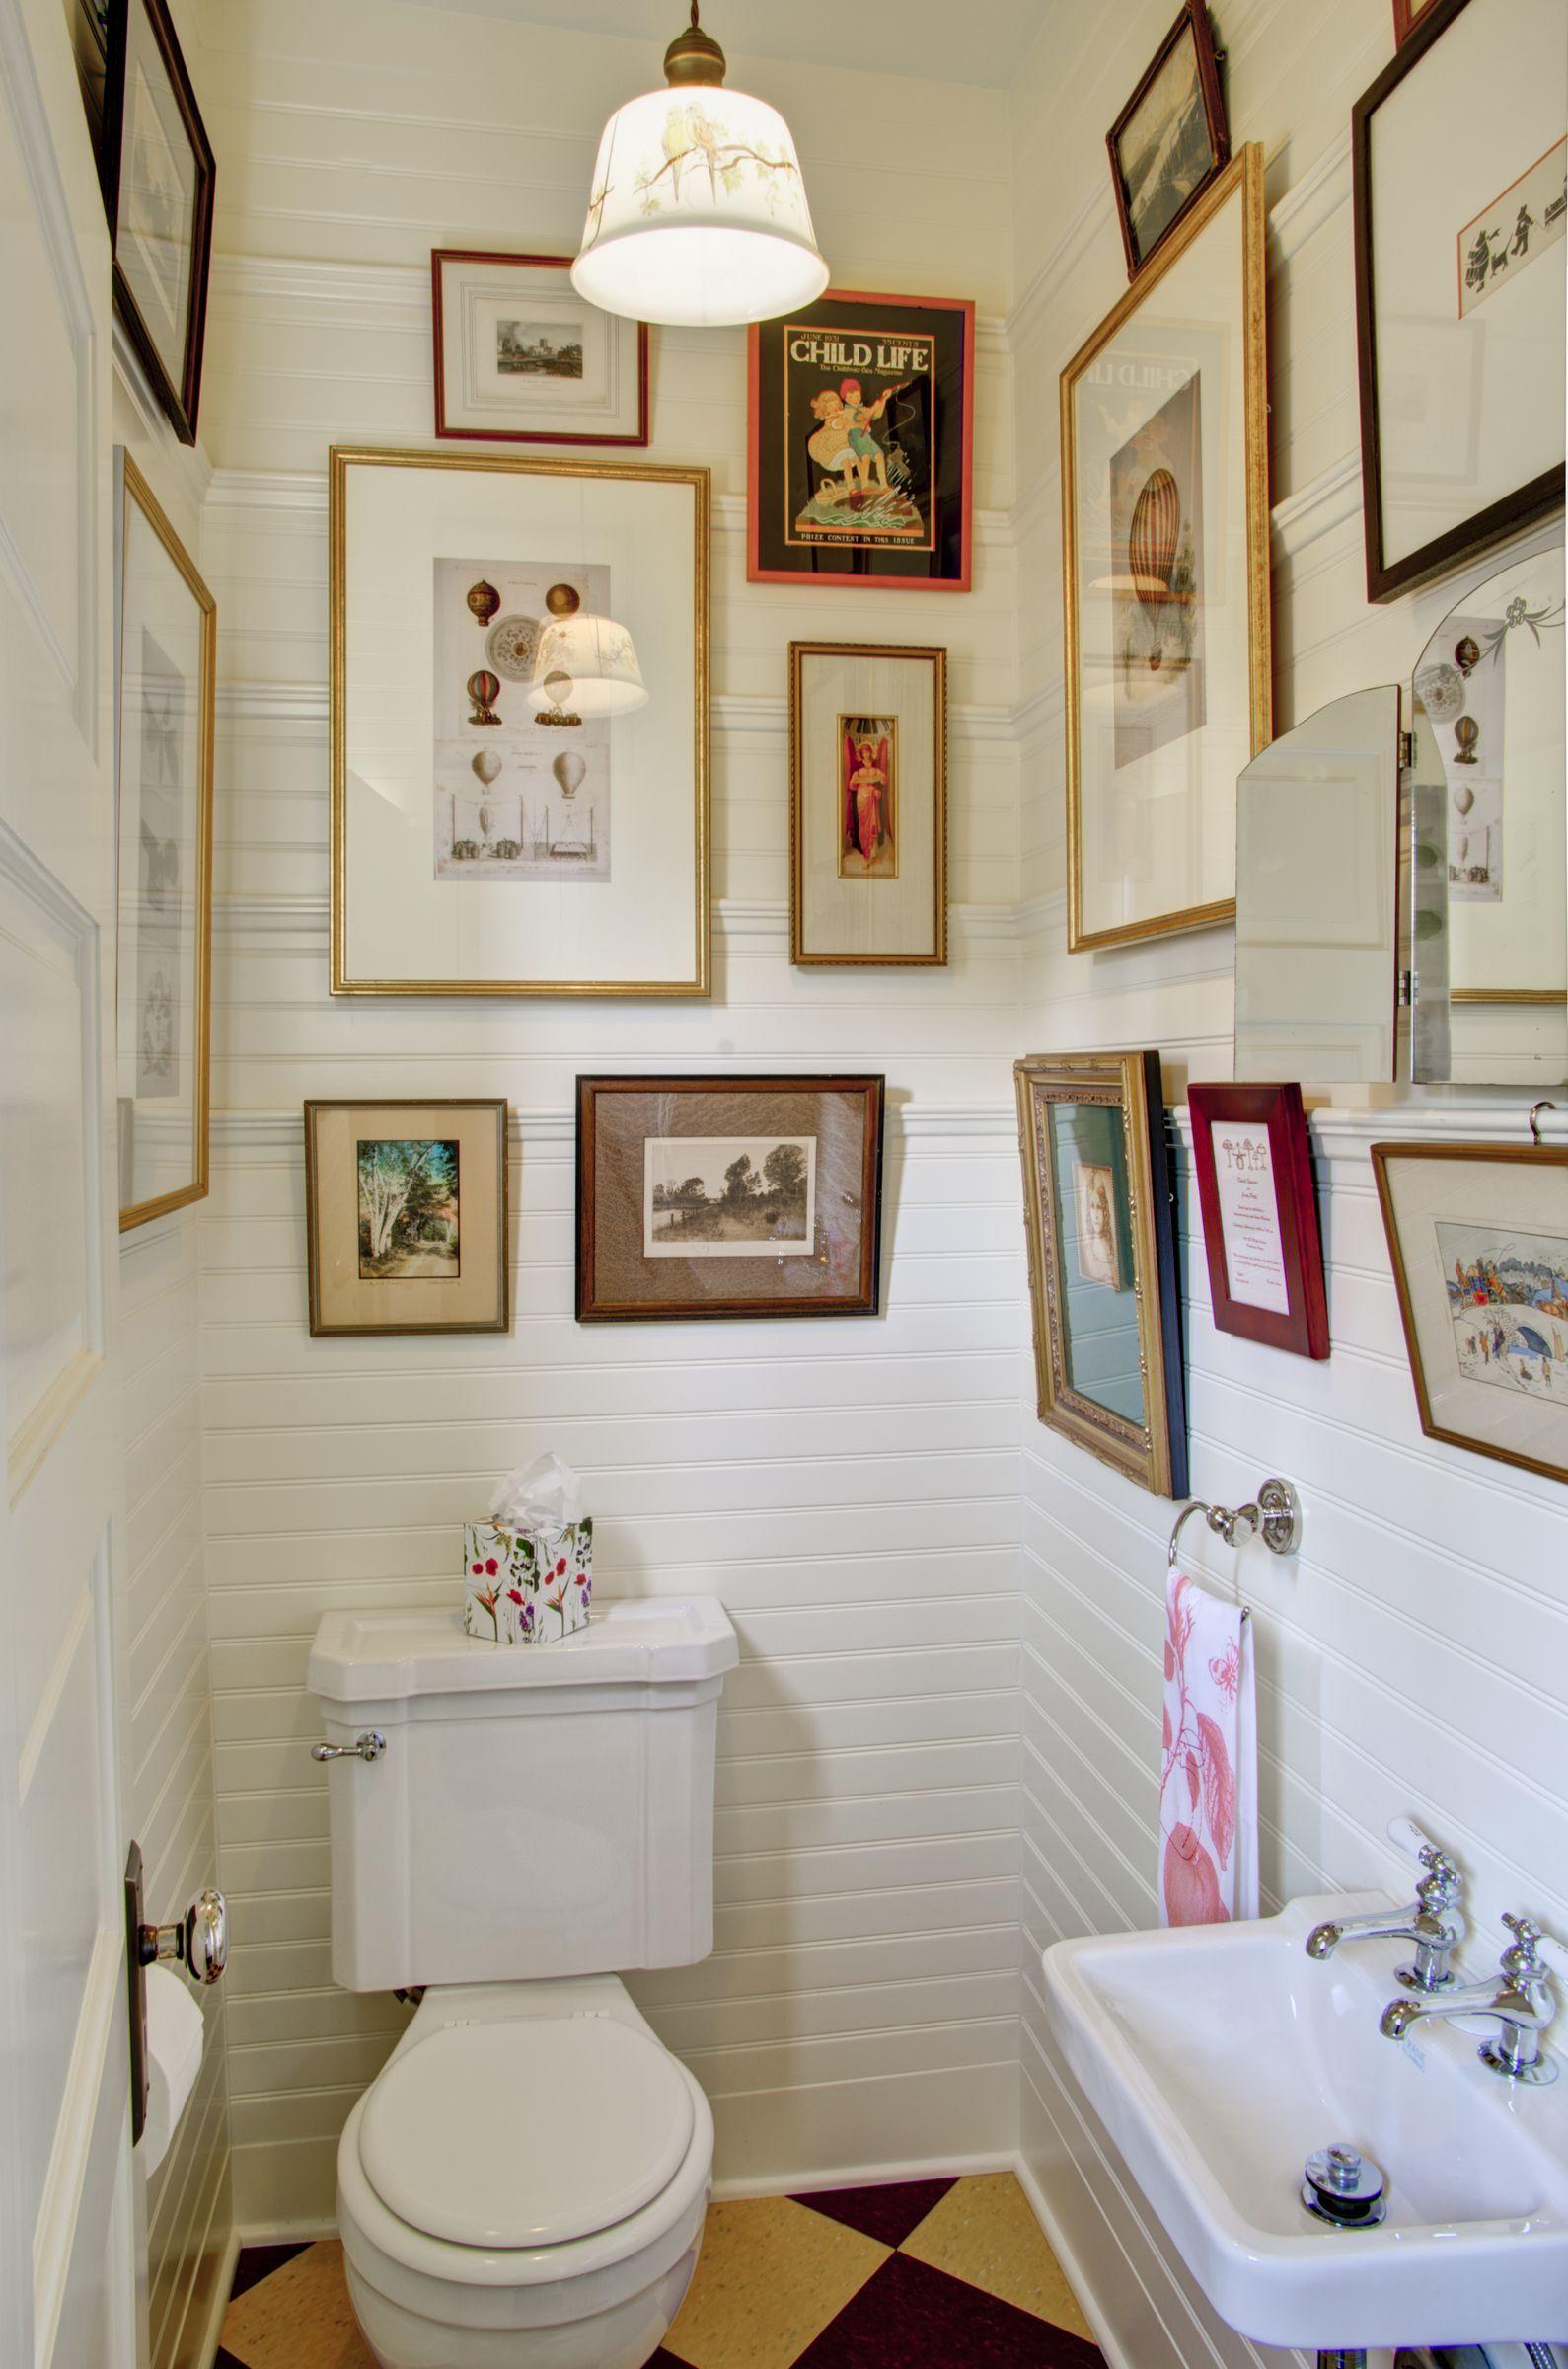 Diy bathroom wall decor ideas apartment christmas decorating ideas exterior bathroom decor for